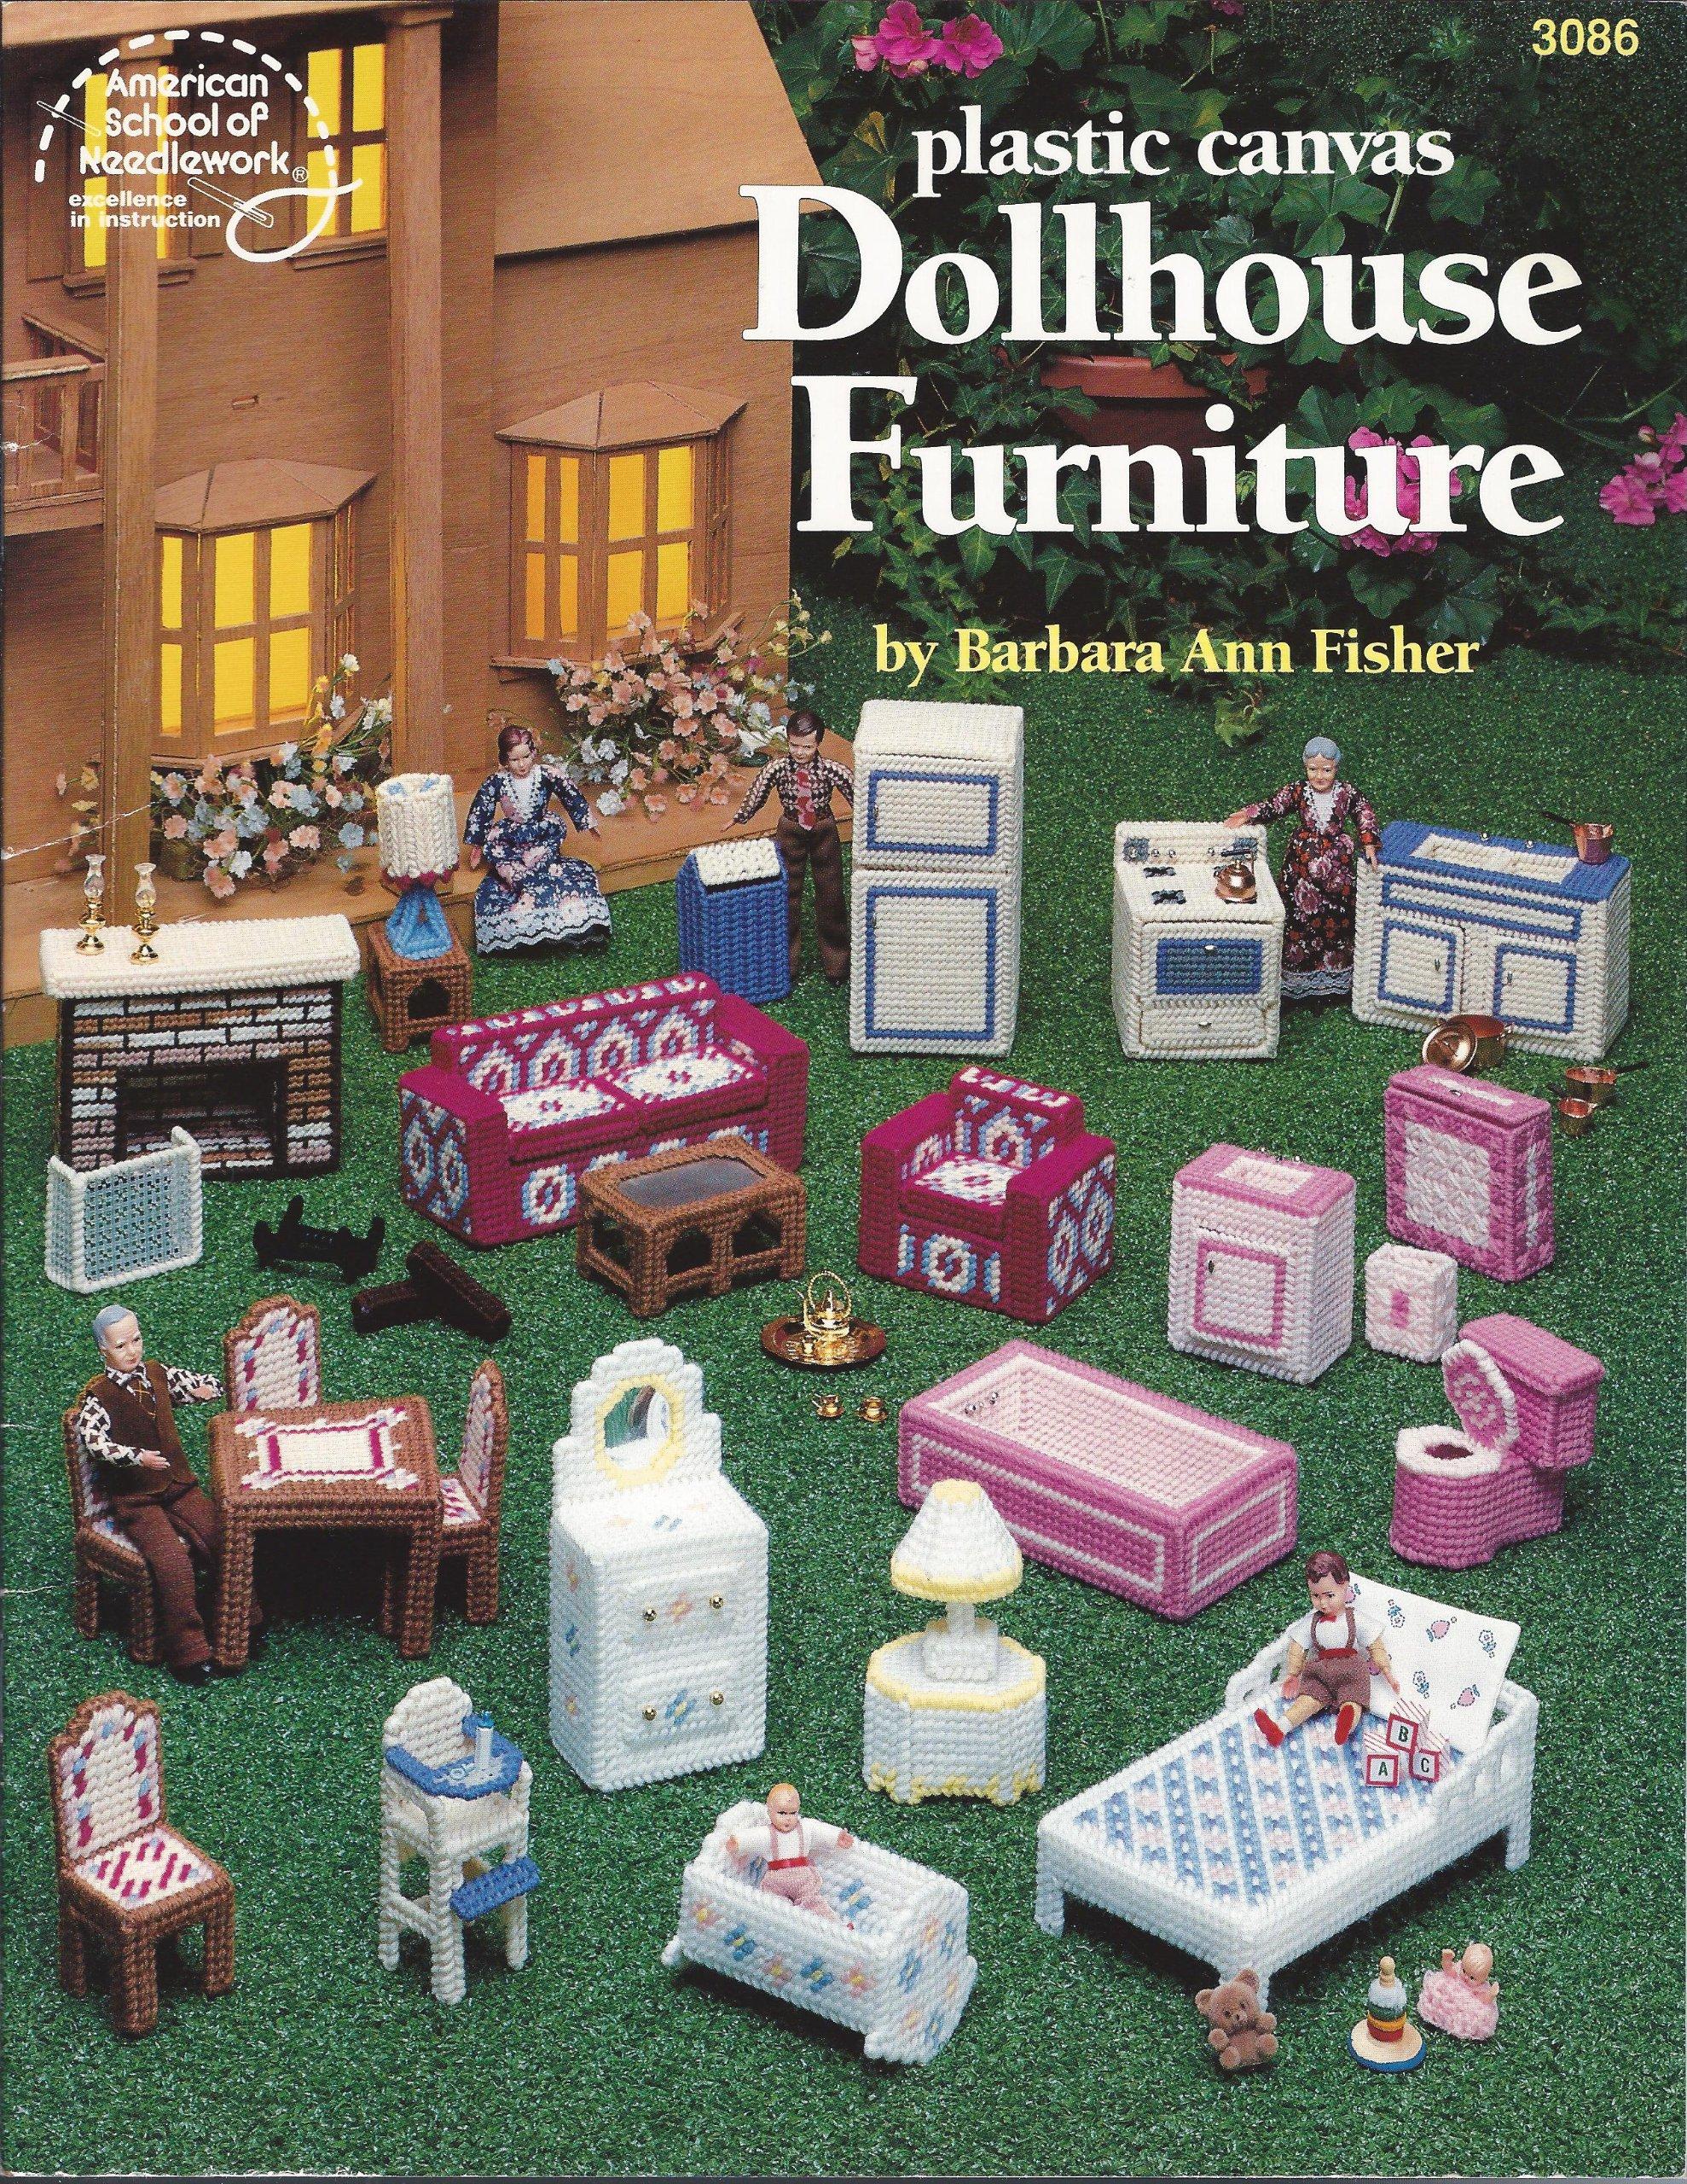 Dollhouse Furniture - Plastic Canvas Craft Book - #3086